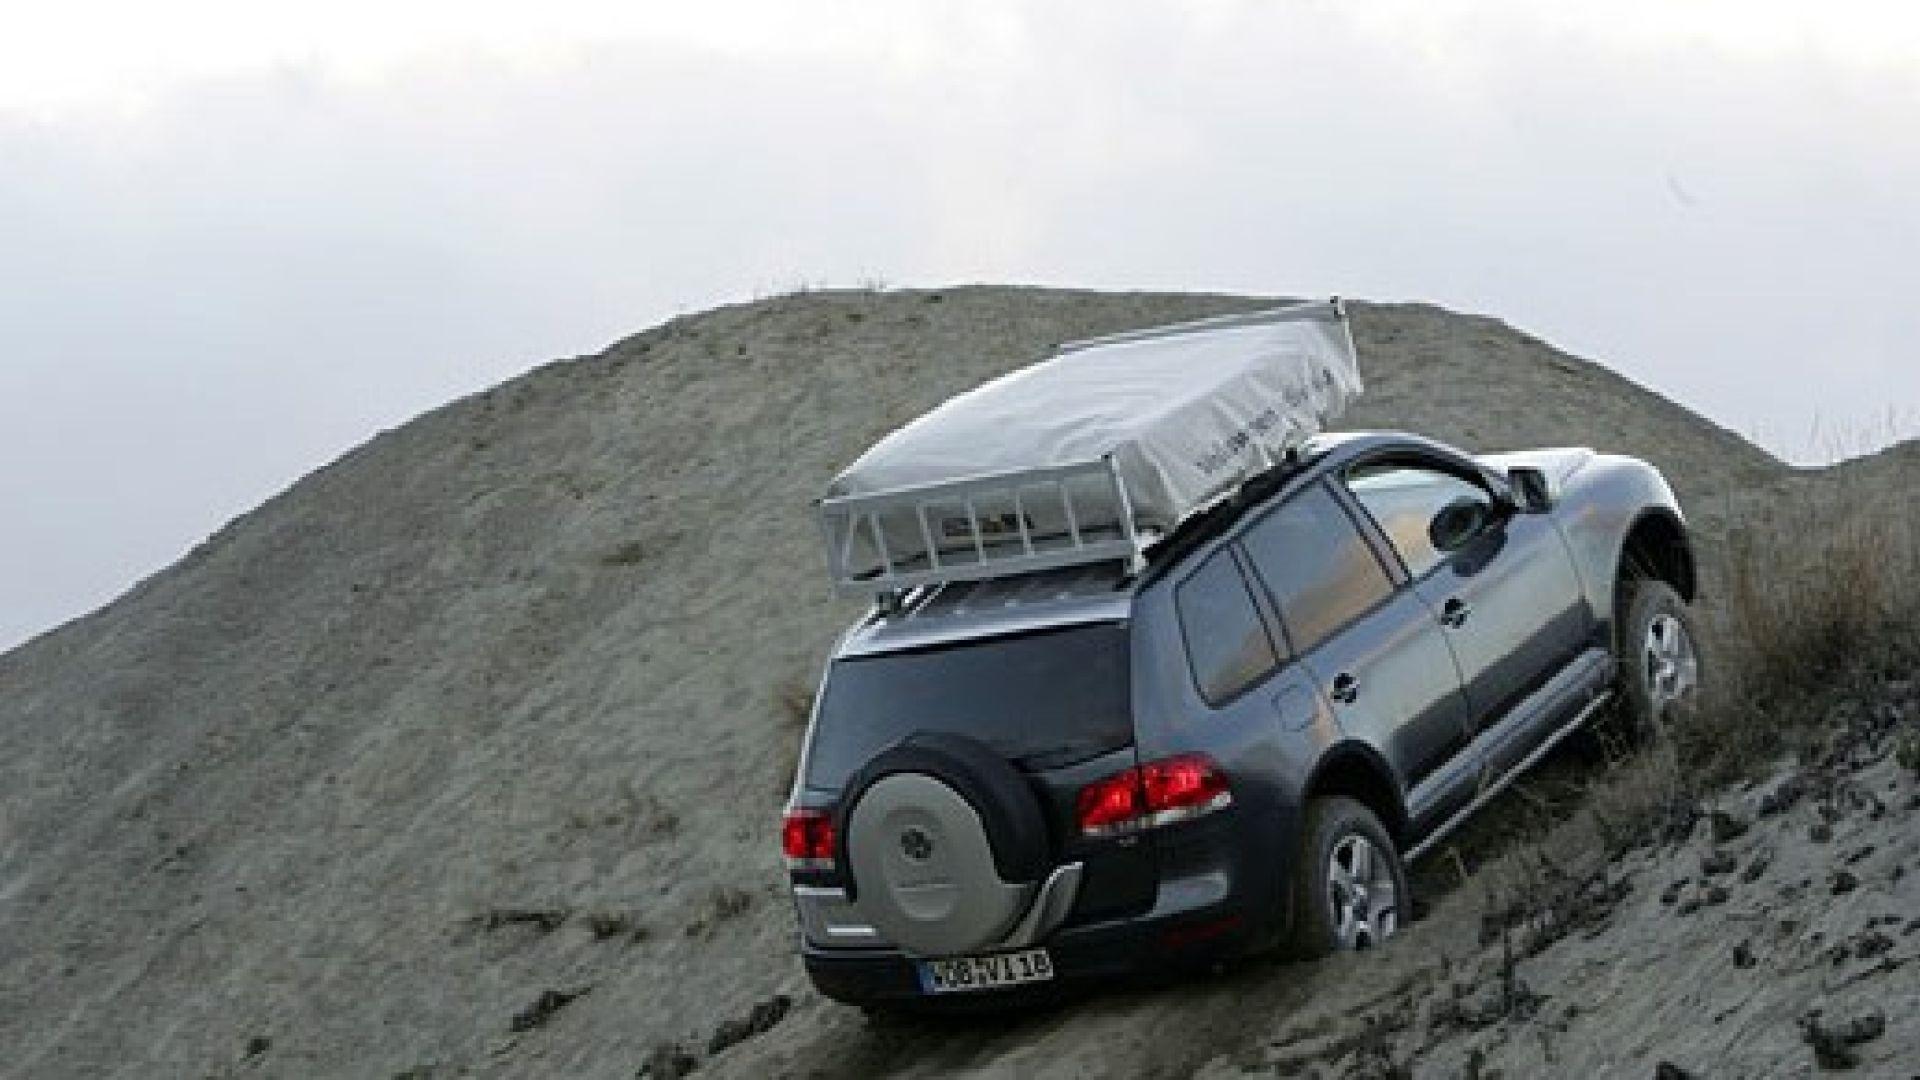 anteprima volkswagen touareg expedition motorbox. Black Bedroom Furniture Sets. Home Design Ideas